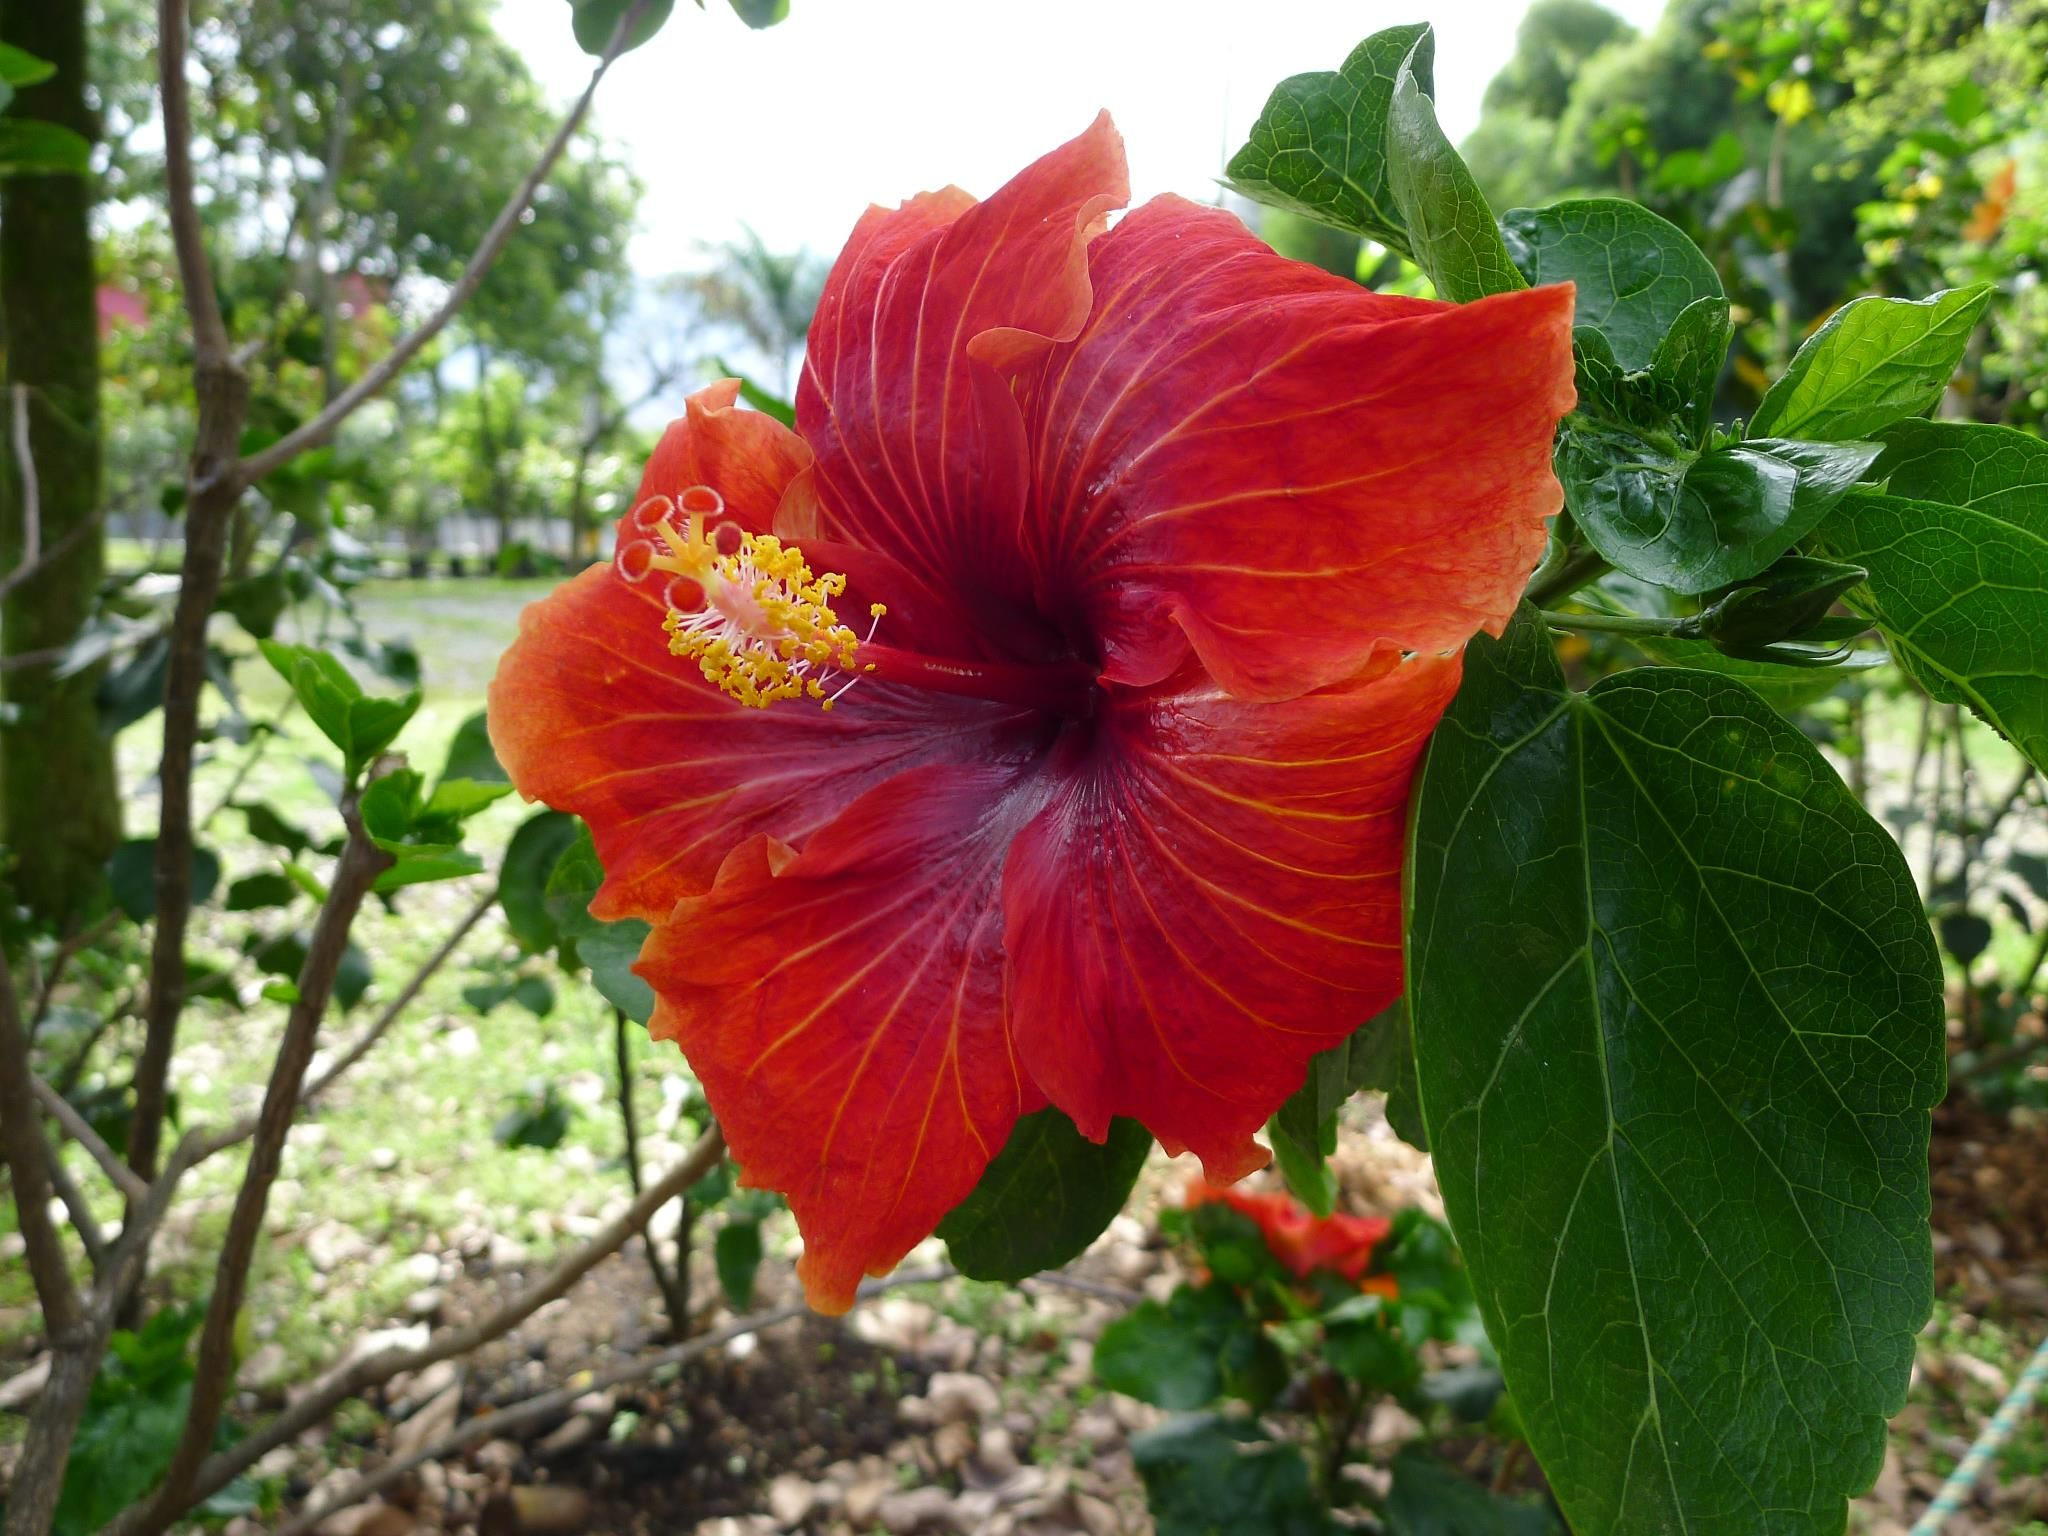 gumamela hibiscus philippine flower philippines i will be there pinterest. Black Bedroom Furniture Sets. Home Design Ideas